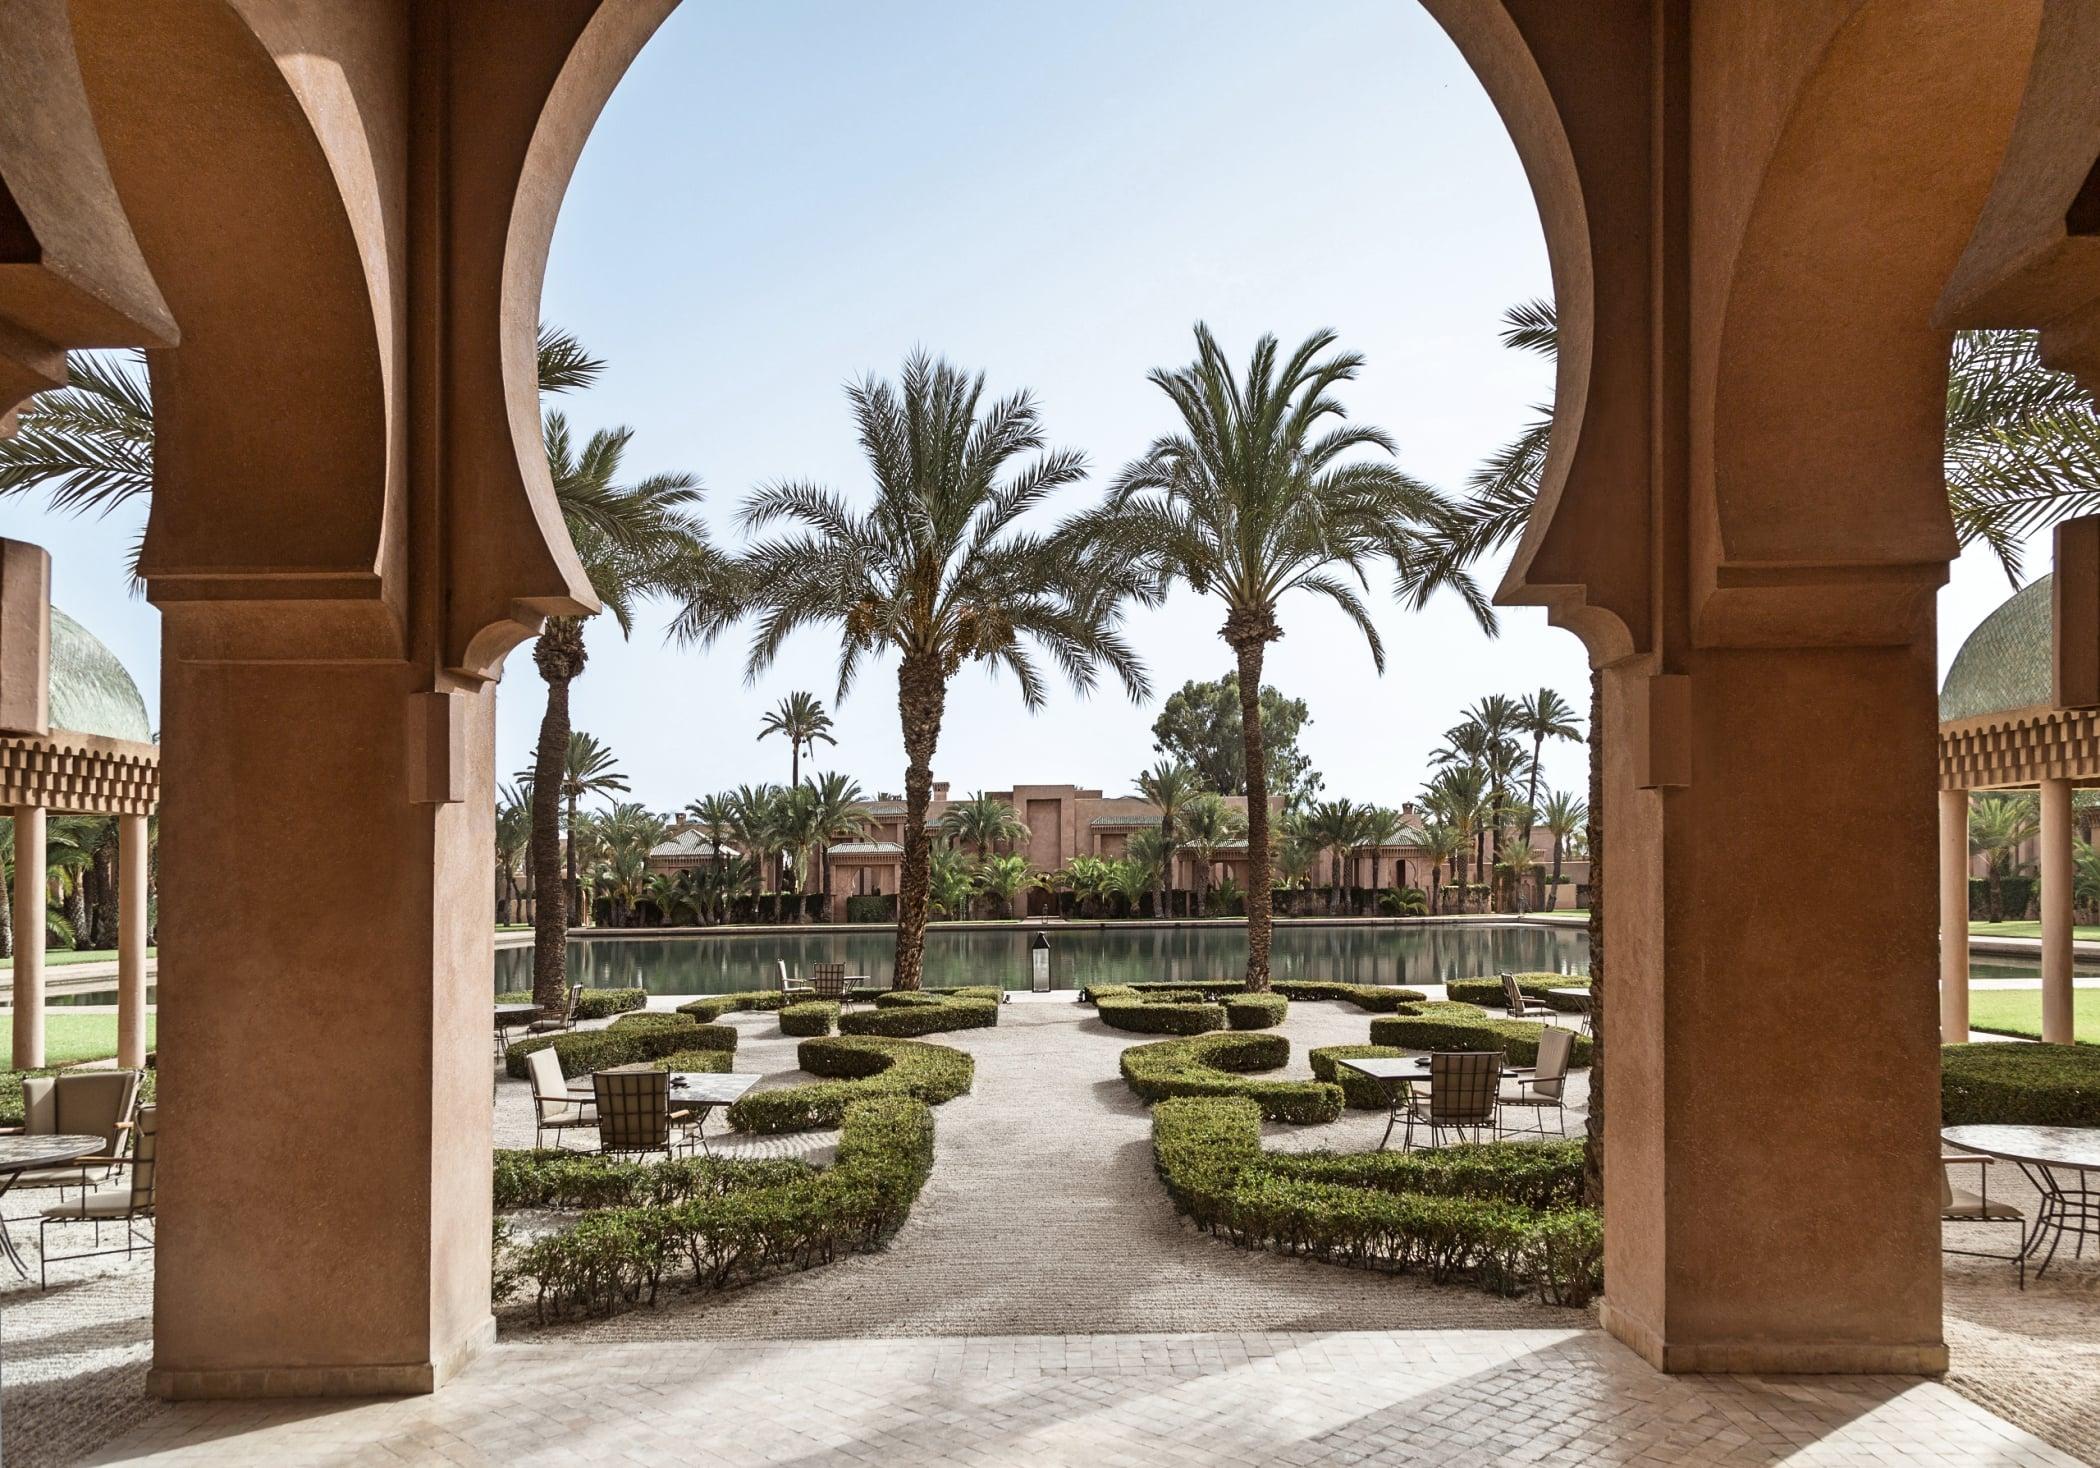 Aman_Amanjena_Morocco_gardens_fivestardestination_five_star_destination_1